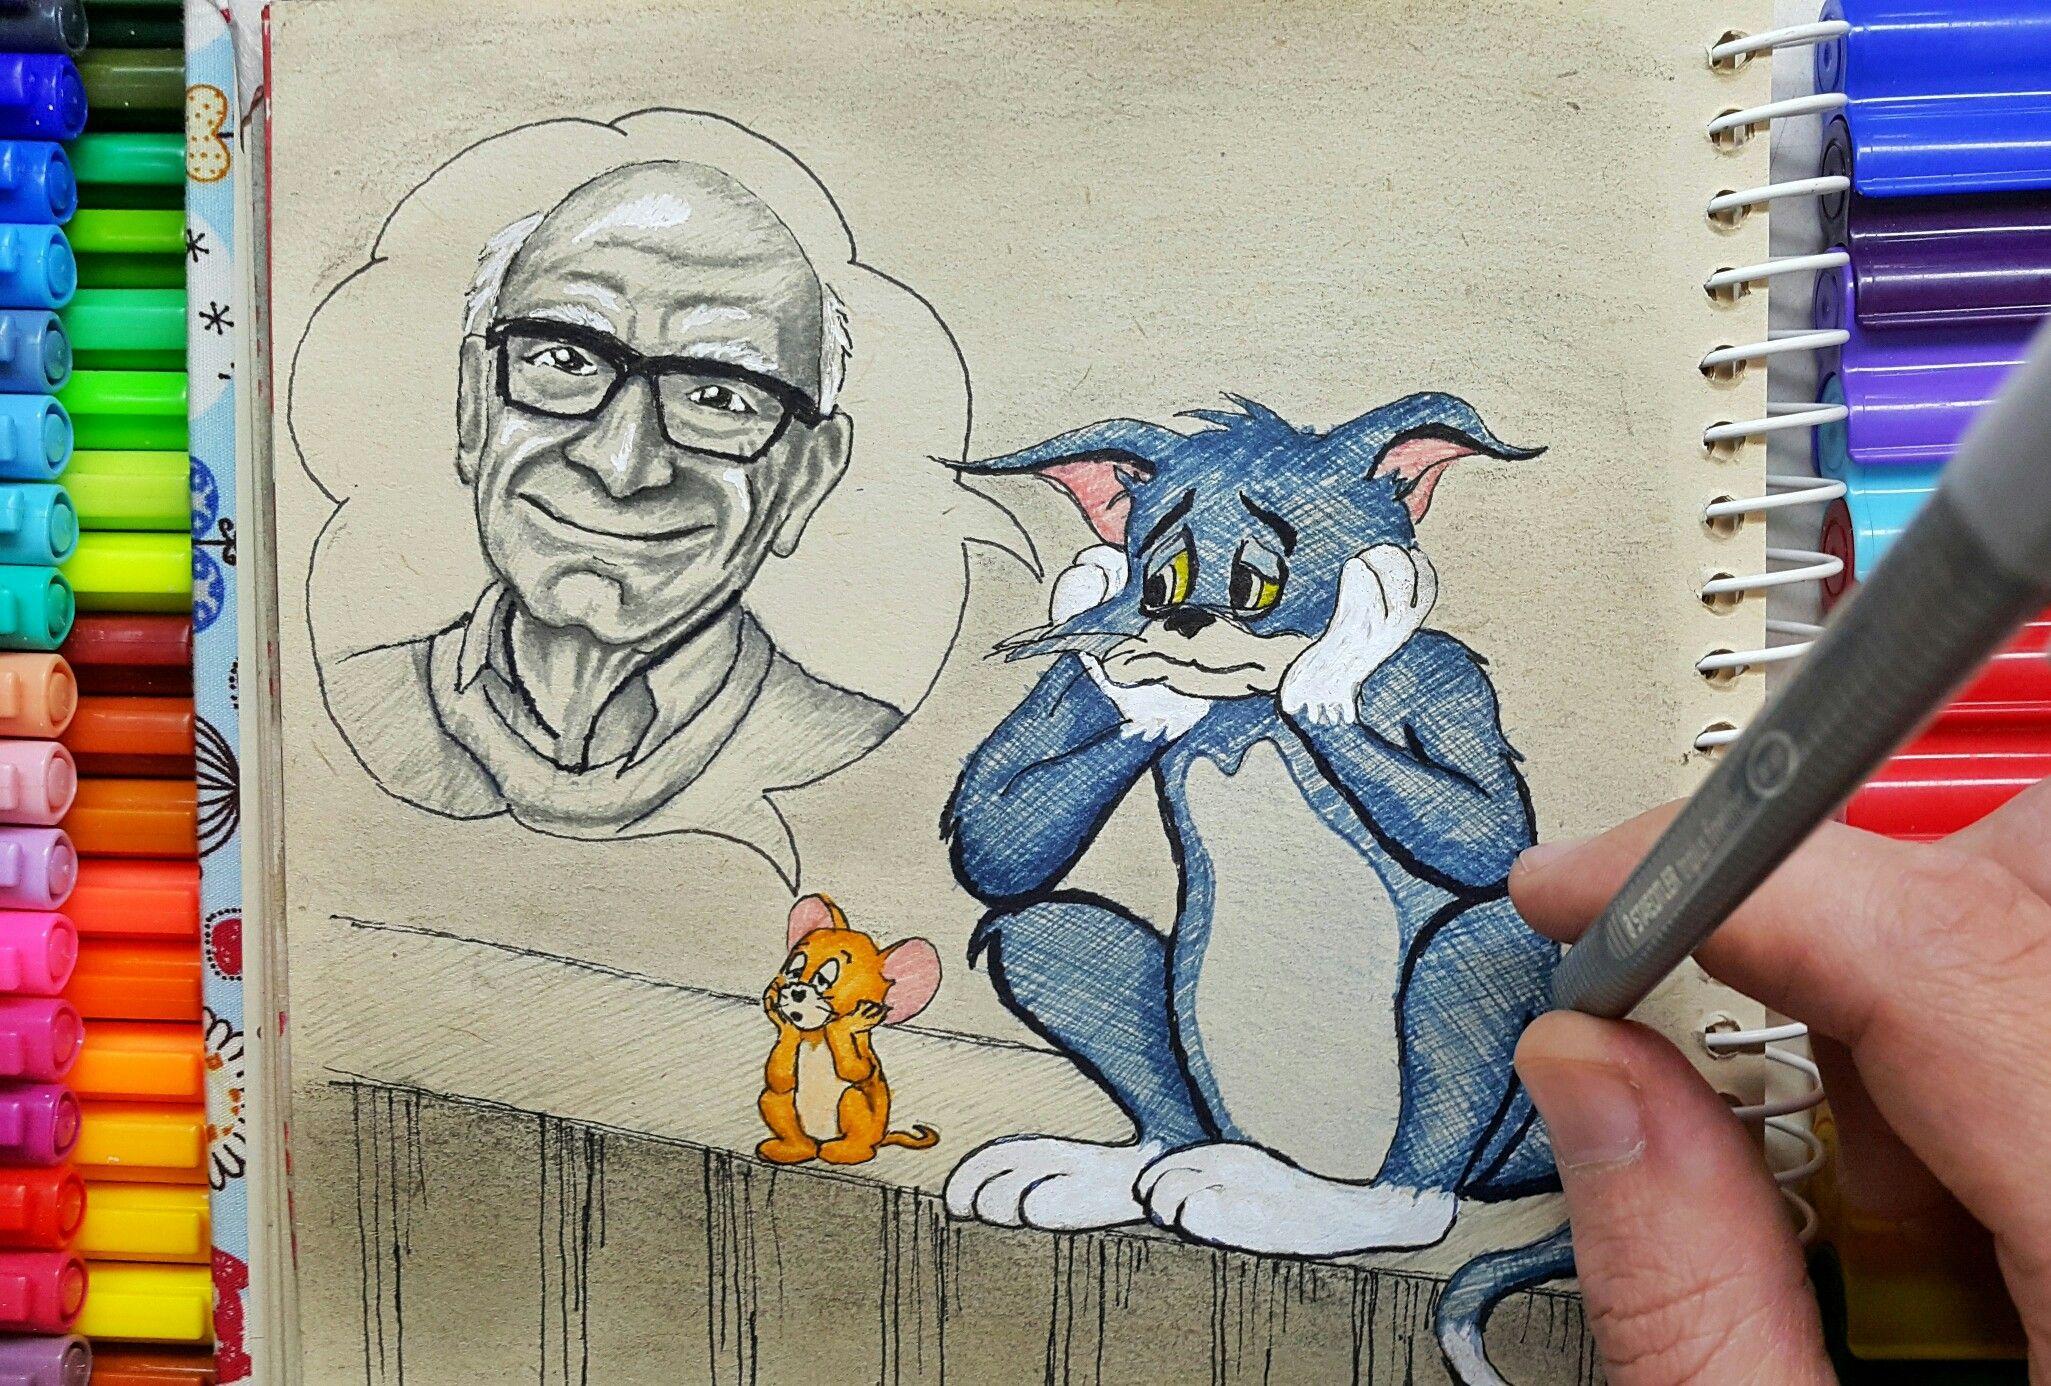 Gene Deitch Dead Tom Jerry Director Childhood Memory Maker وفاة جين ديتش توم وجيري صانع ذاكرةالطفول Tom And Jerry Cartoon Captain Kangaroo Cartoon Drawings